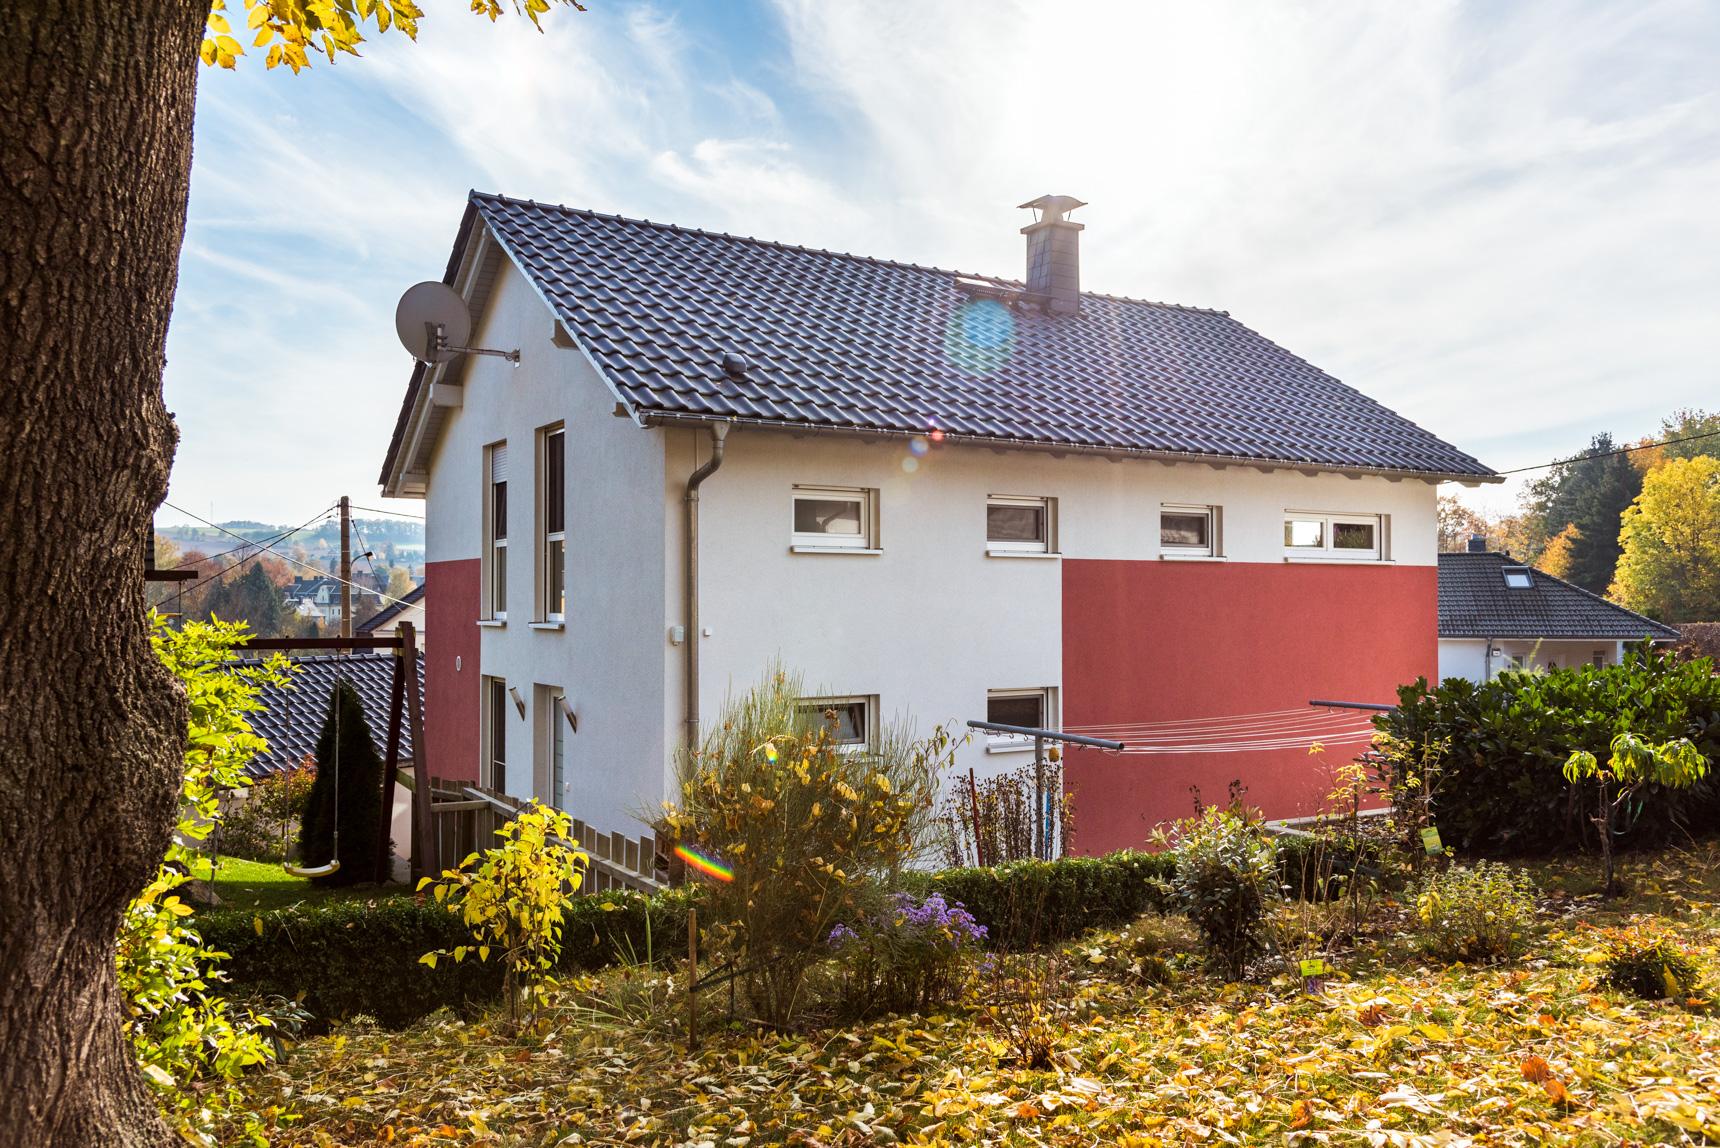 Referenz - Niederwiesa - AGL Massivhaus Projektbau GmbH